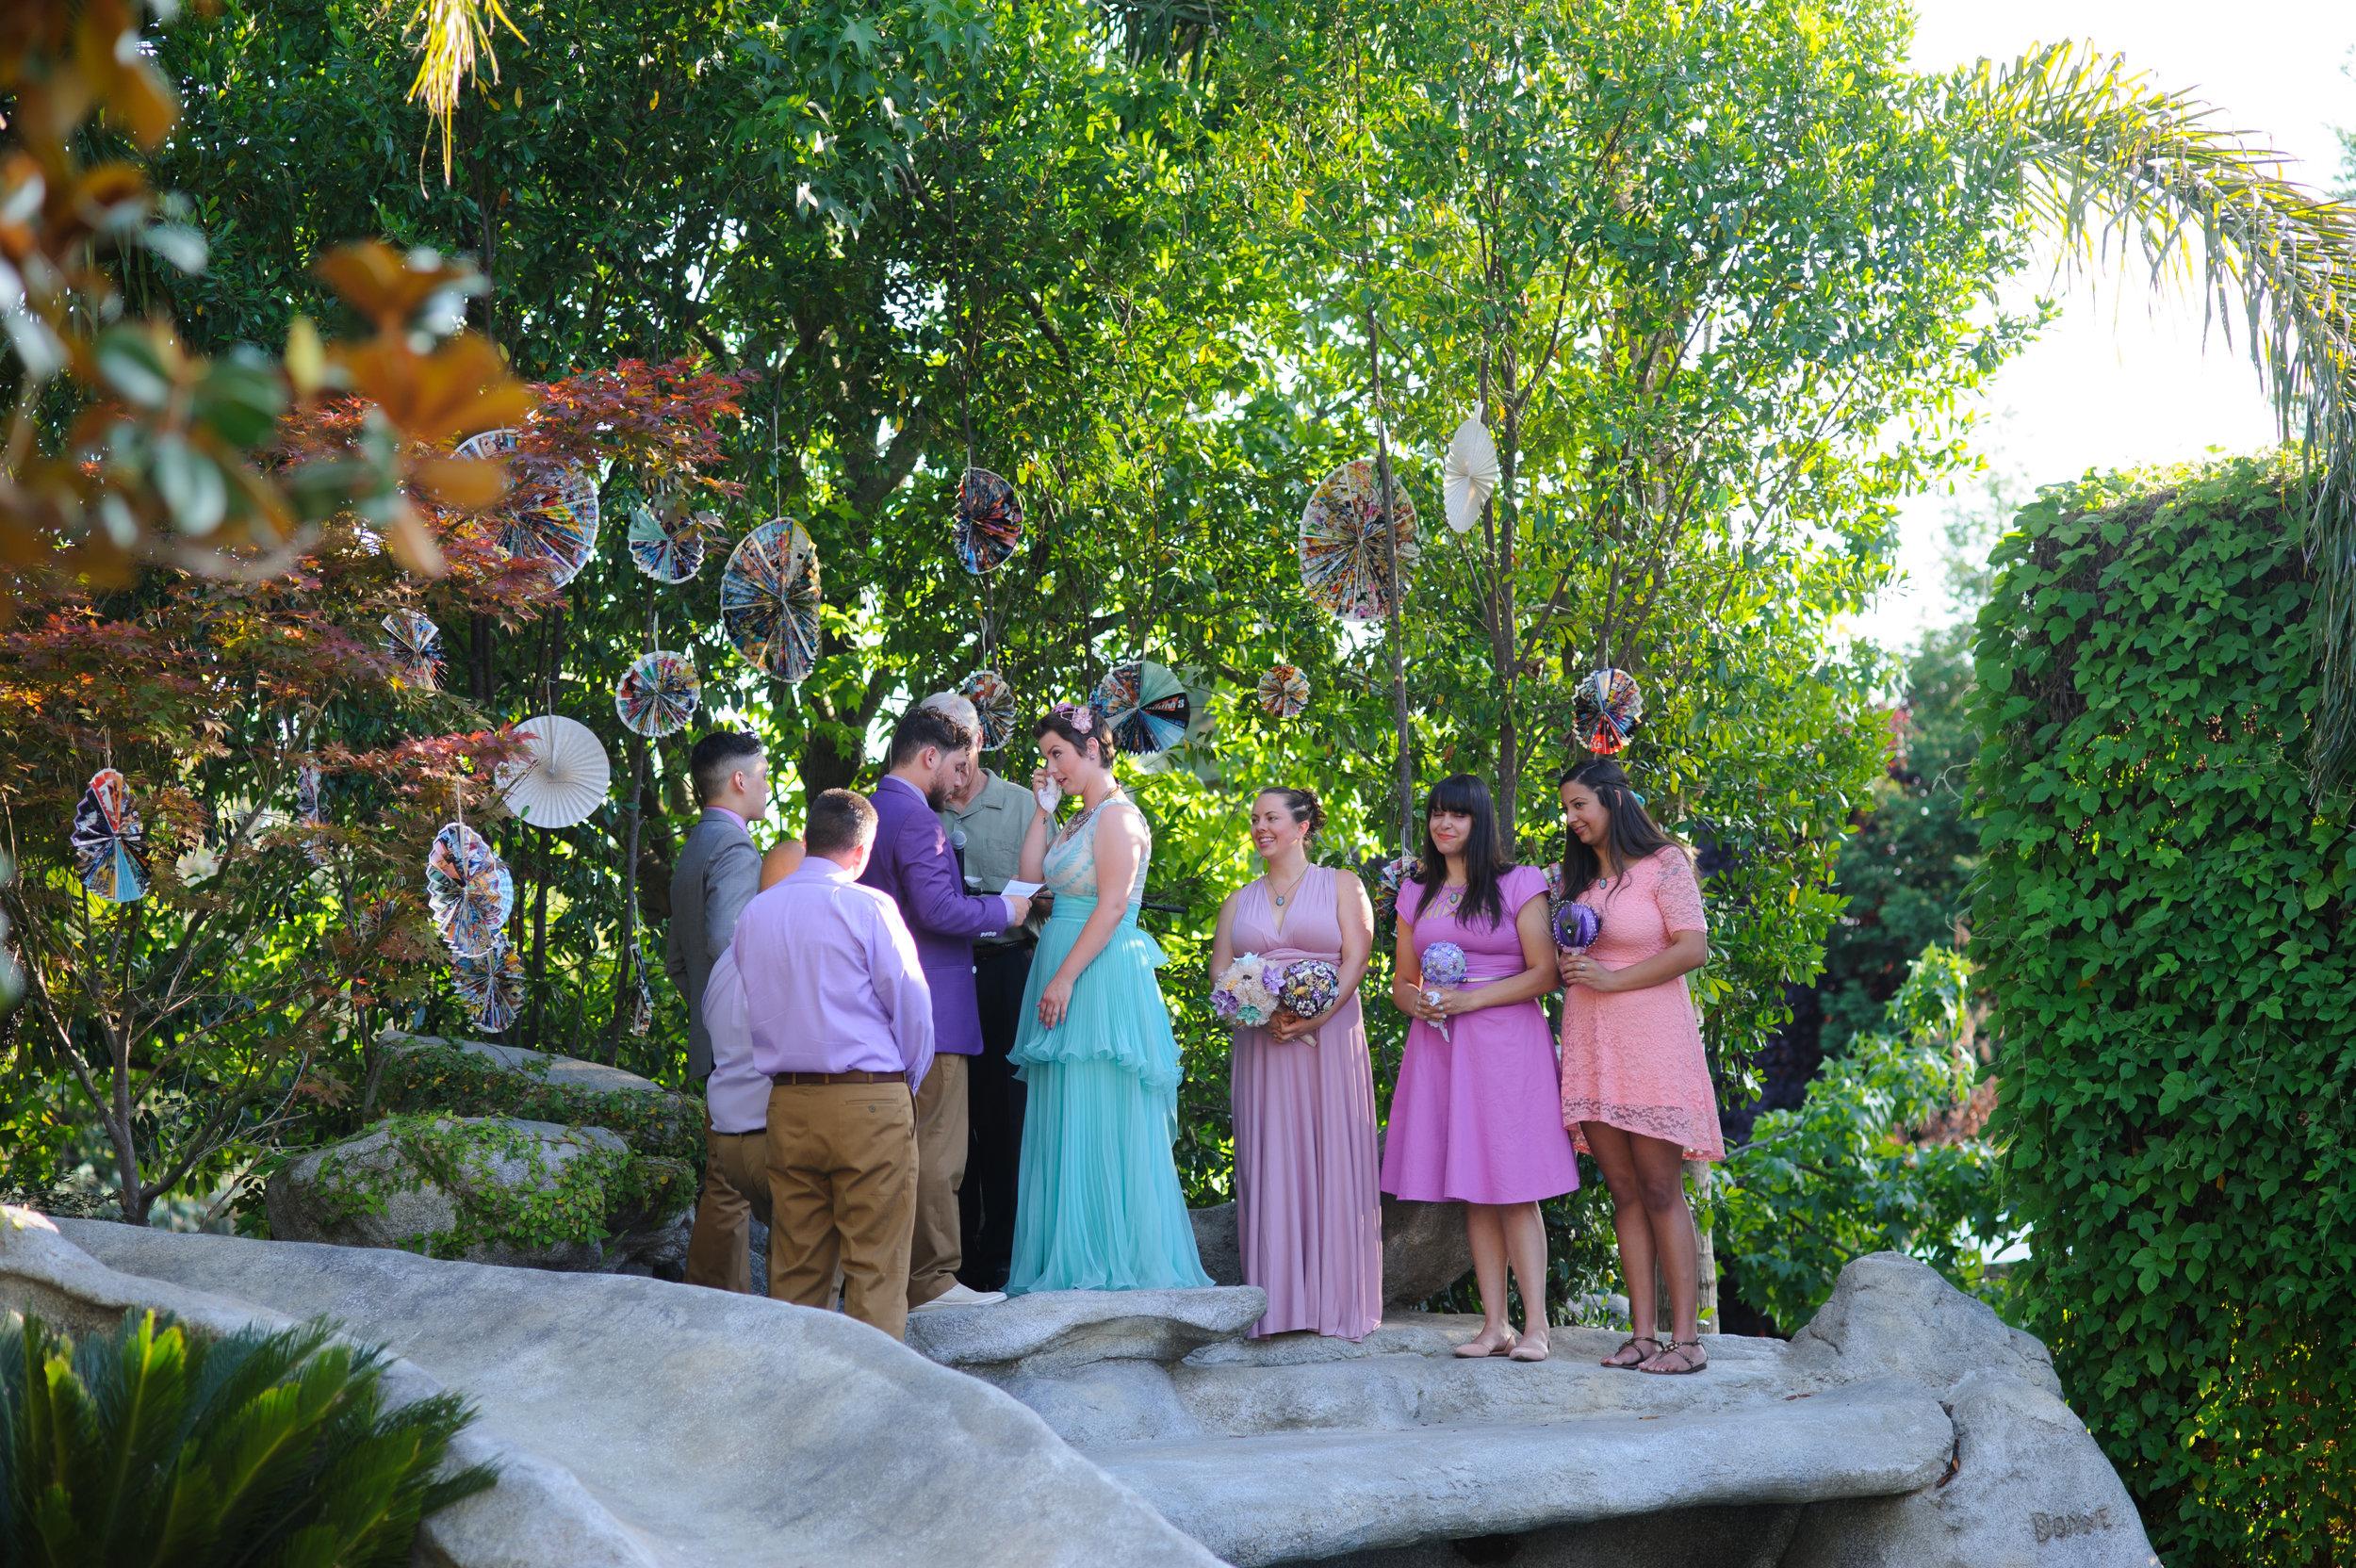 chloe-evan-021-backyard-sacramento-wedding-photographer-katherine-nicole-photography.JPG